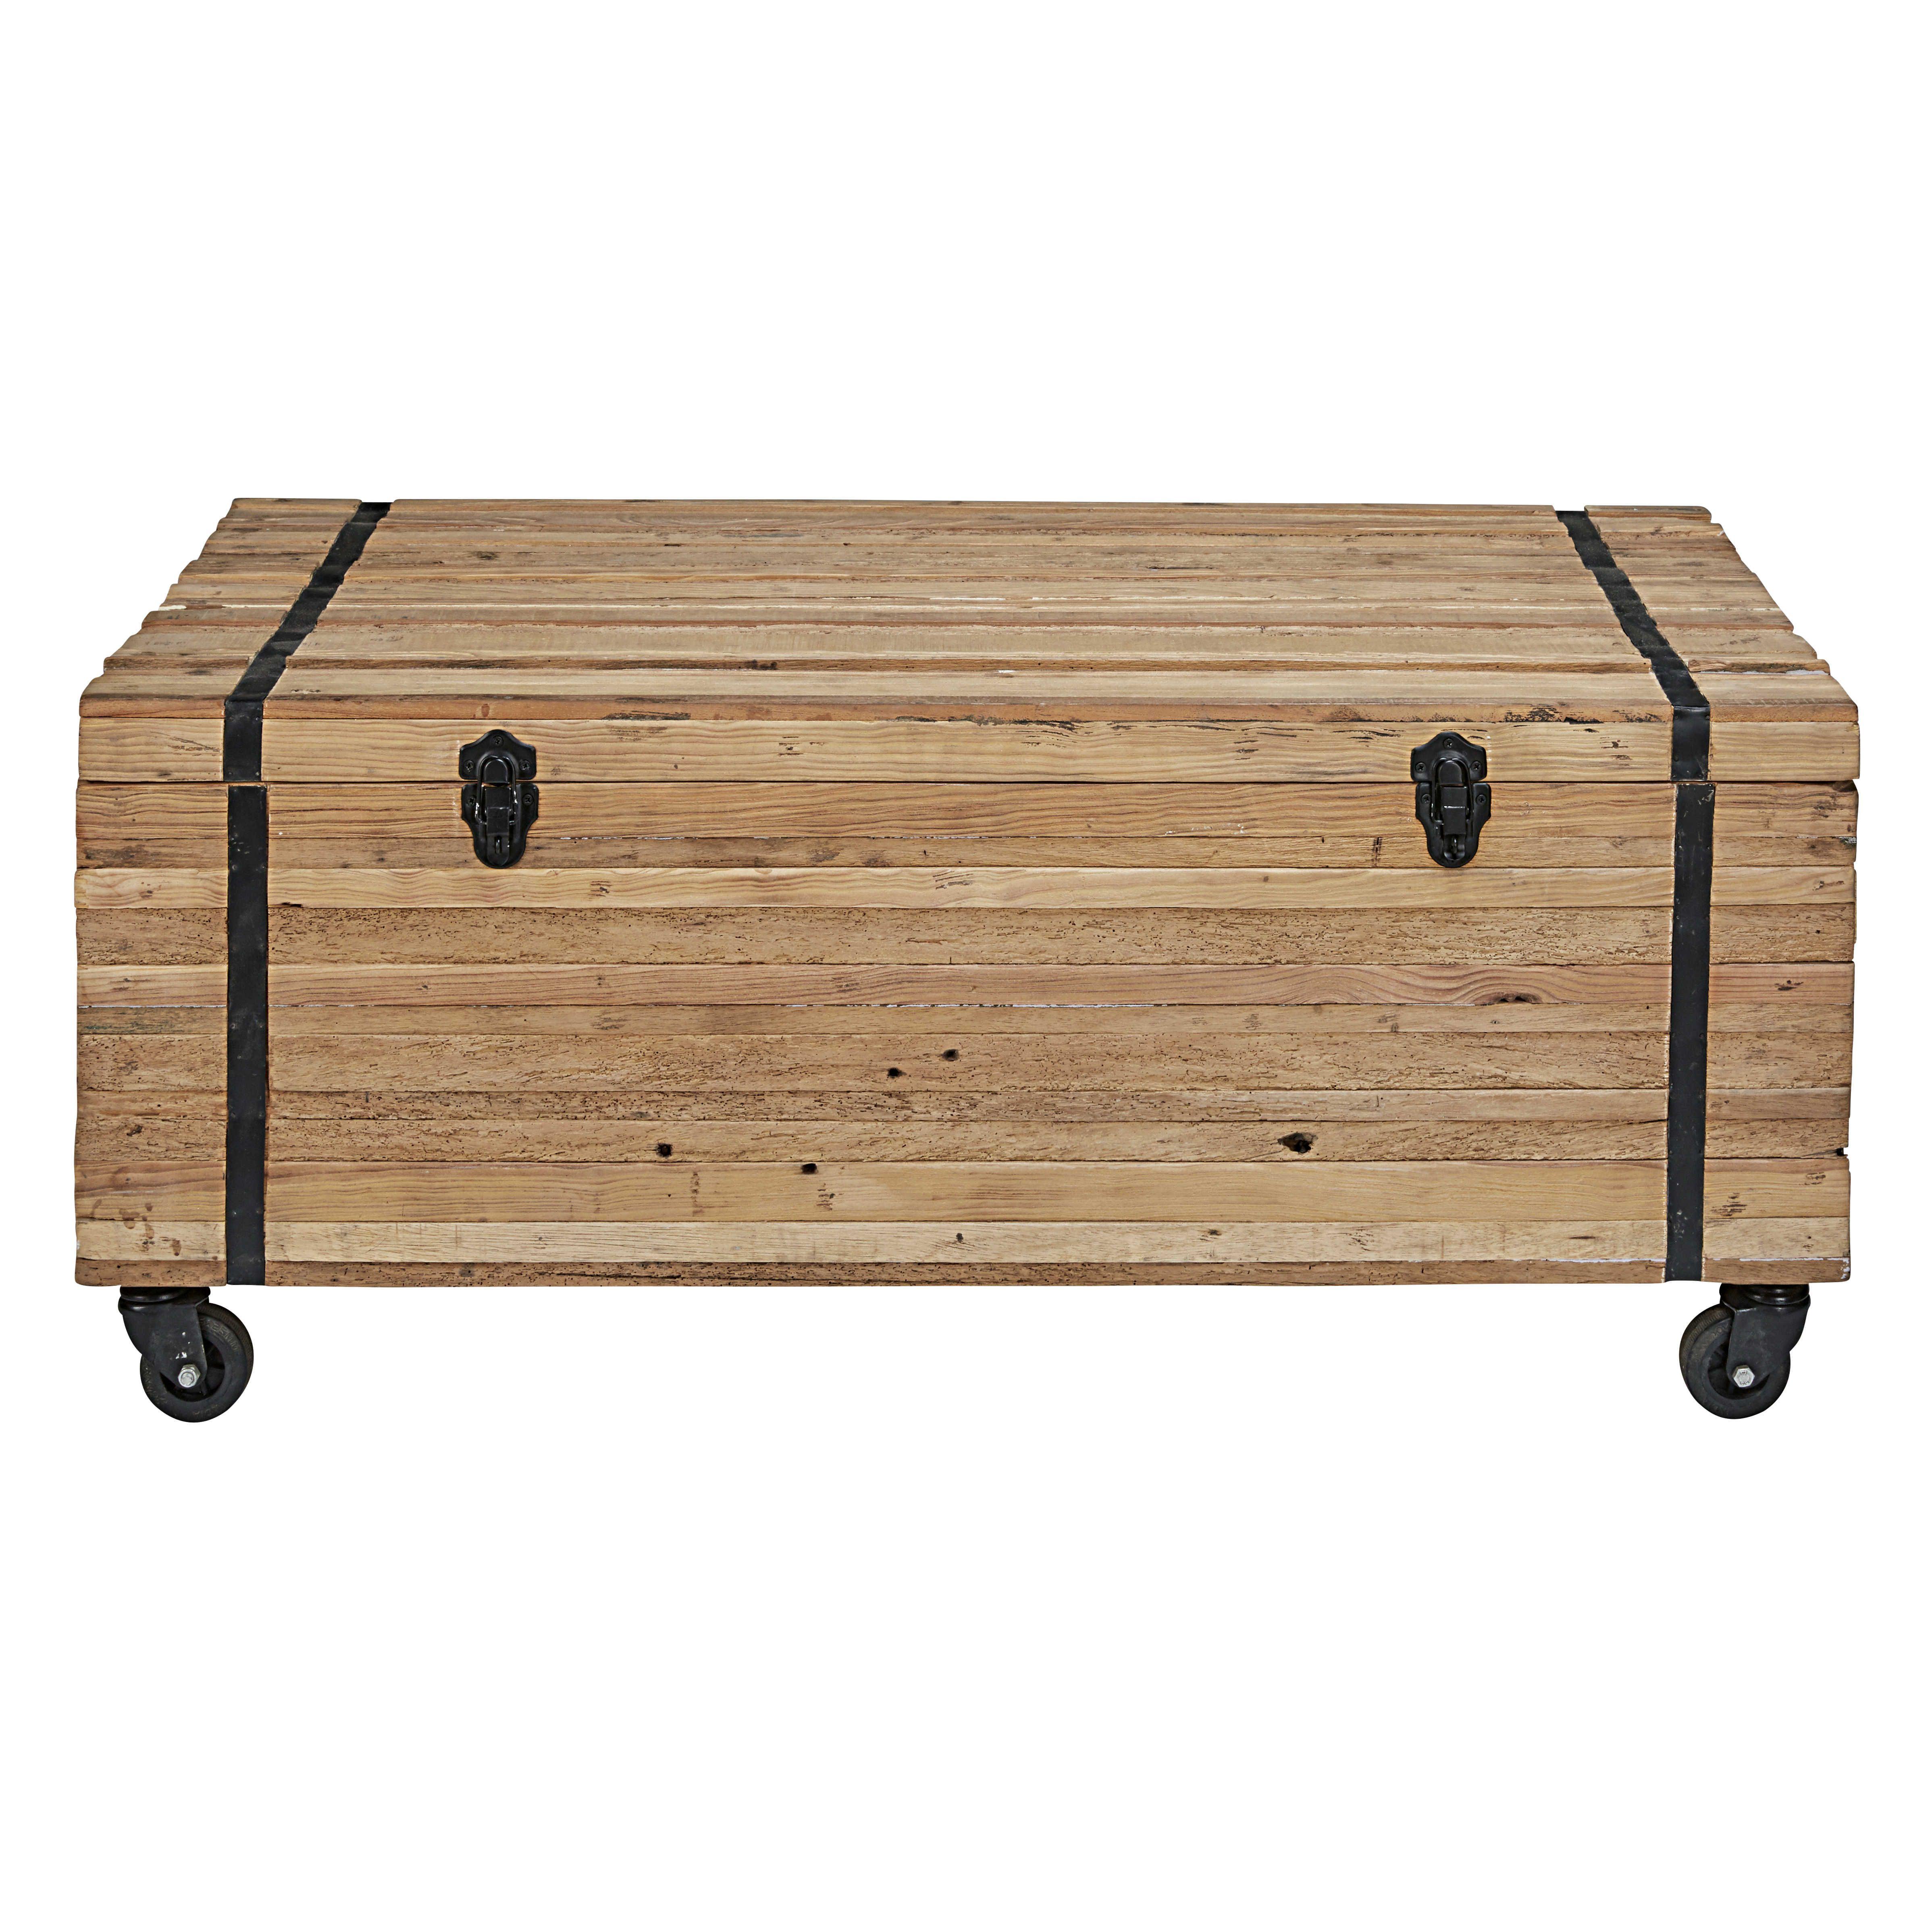 Rollcouchtisch Aus Recyclingholz Jetzt Bestellen Unter Https Moebel Ladendirekt De Wohnzimmer Tische Couchtische Uid Ab543dff F Couchtische Tisch Recycling